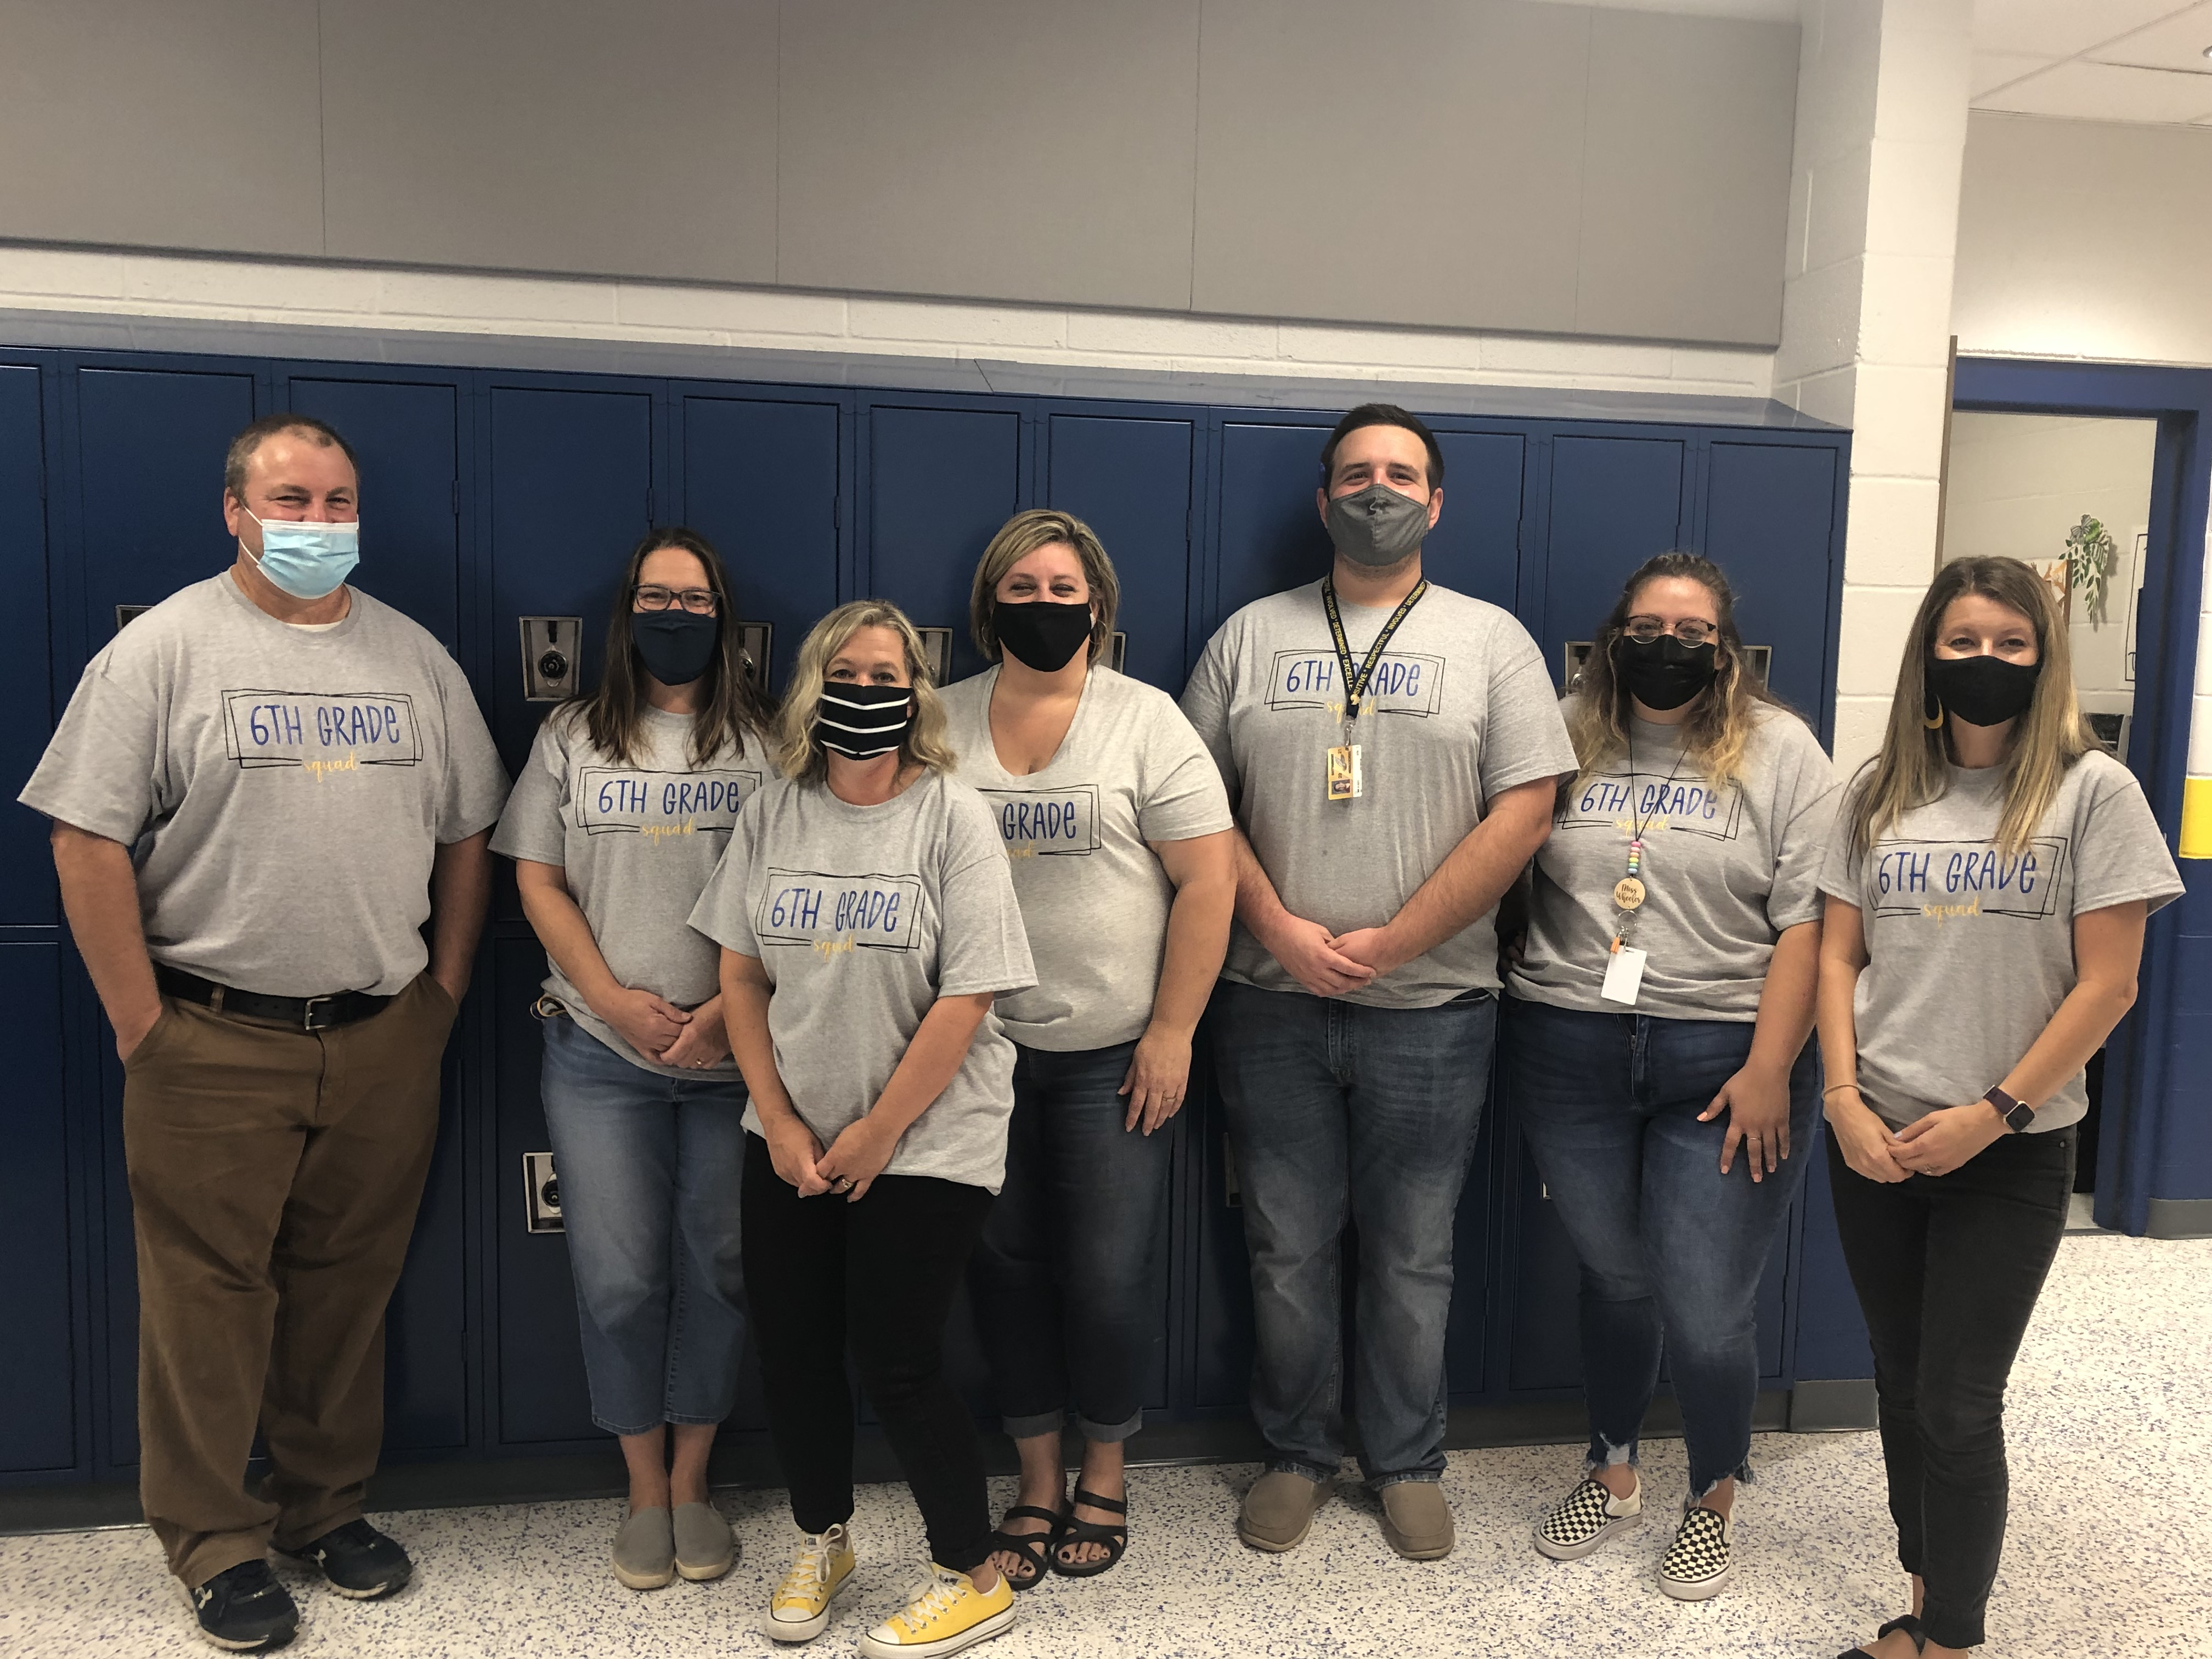 6th grade staff